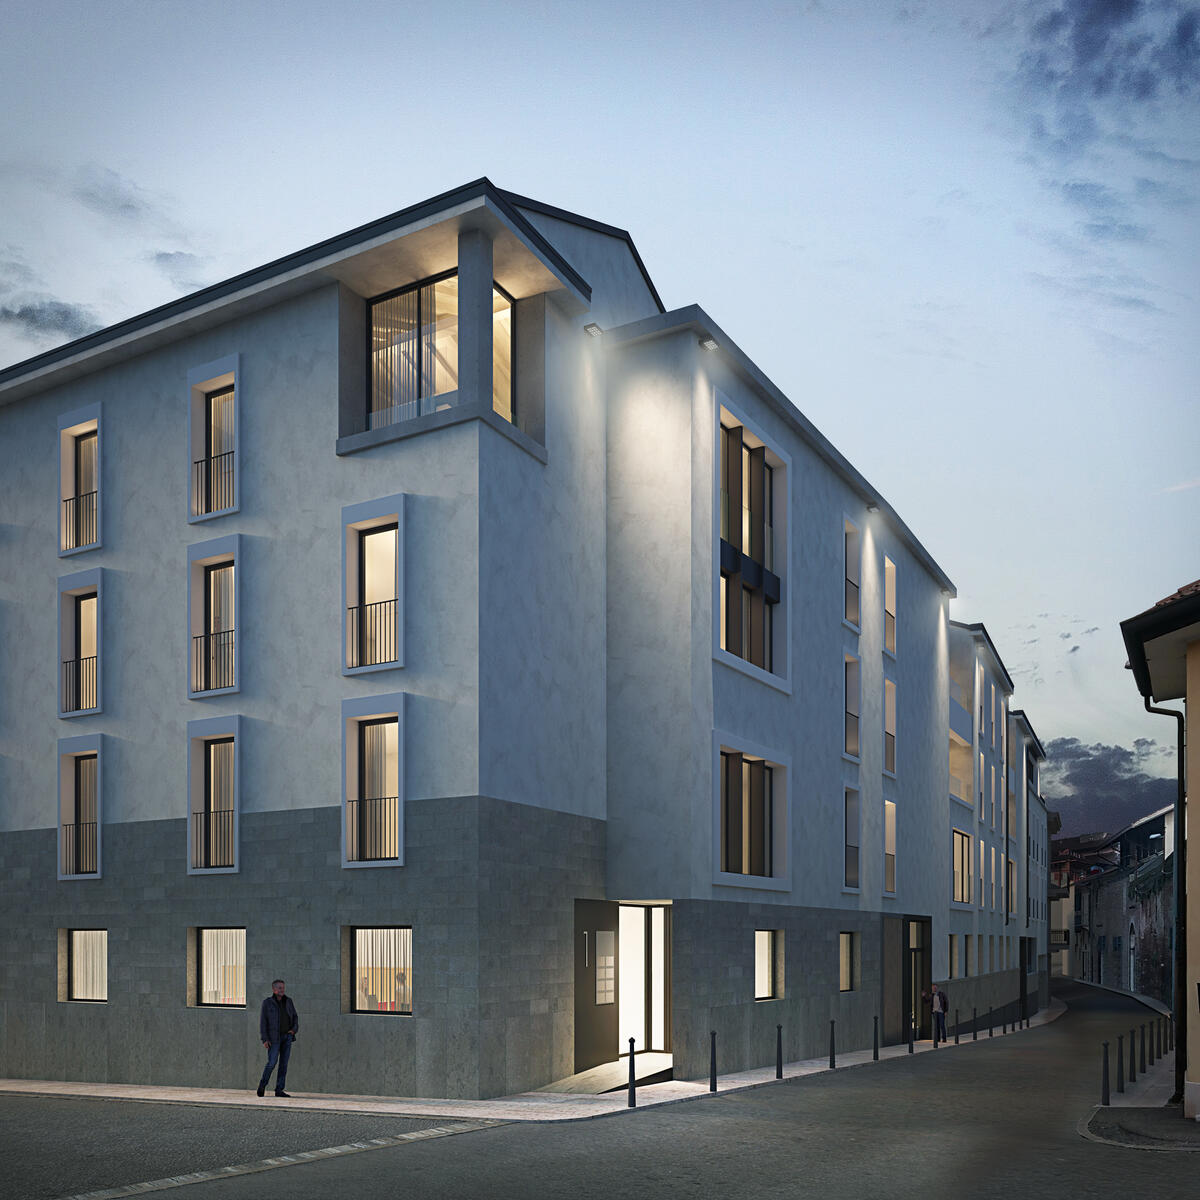 2 camere Residenziali in vendita - 5